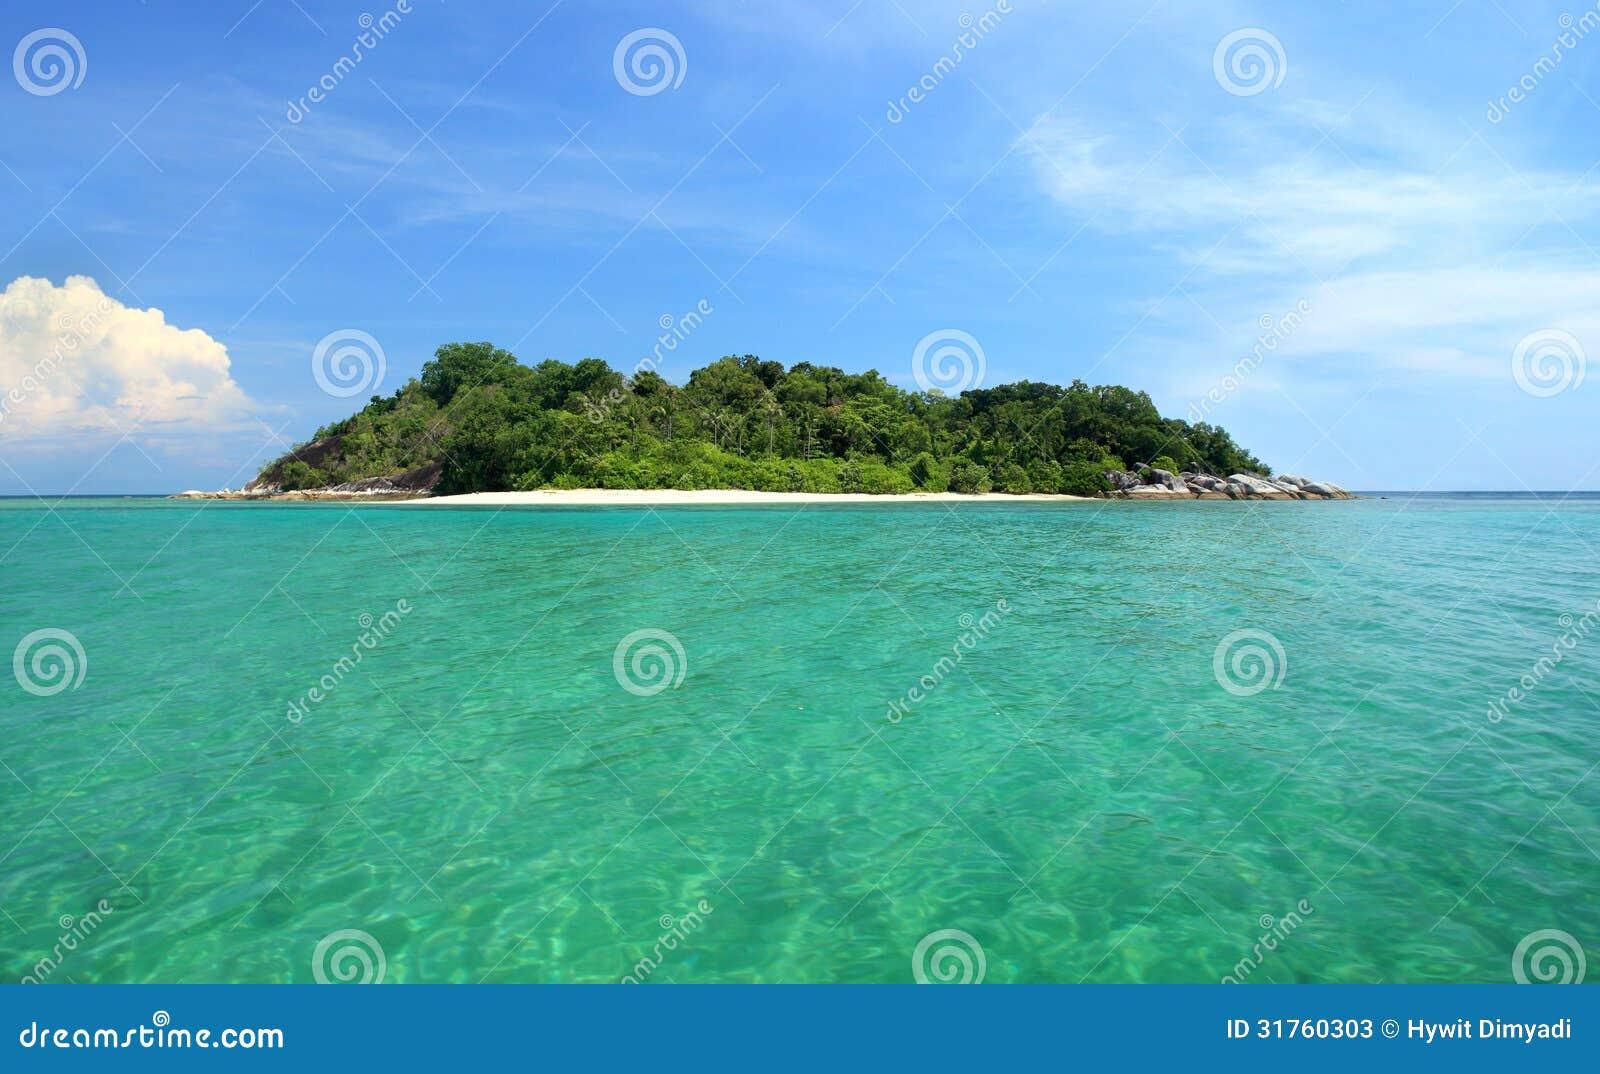 Tropical Island Getaways: Tropical Island, Getaway Paradise Stock Photos